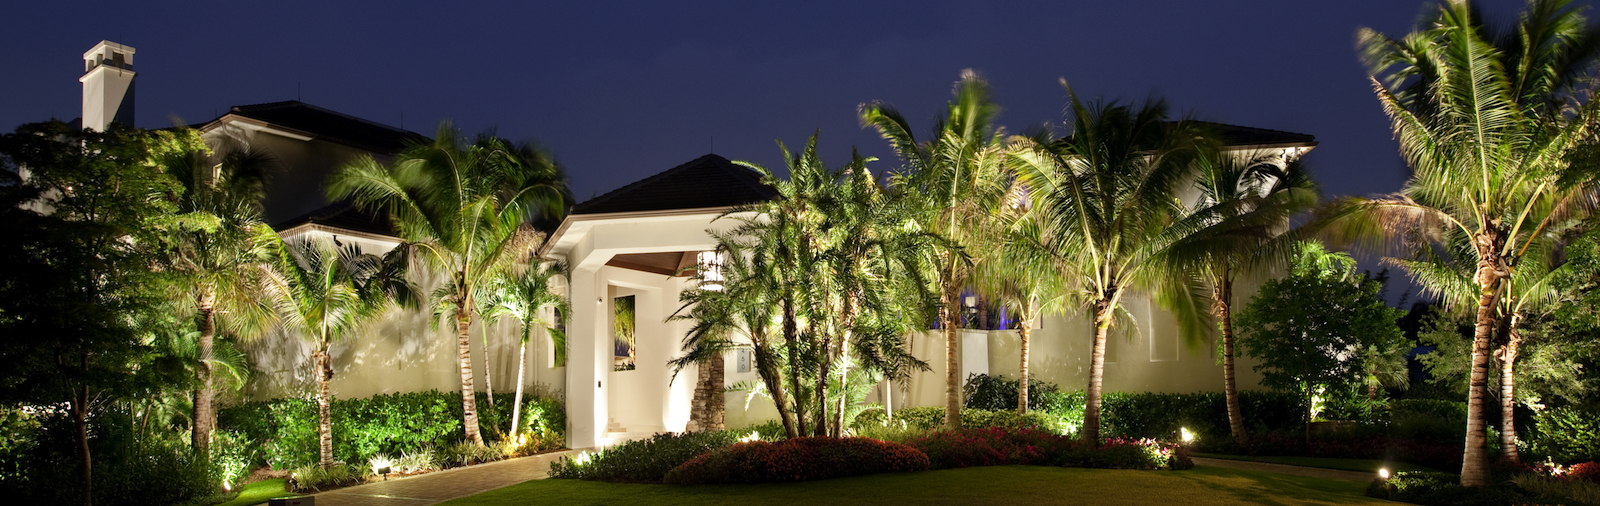 New Home Construction - Custom Luxury Homes